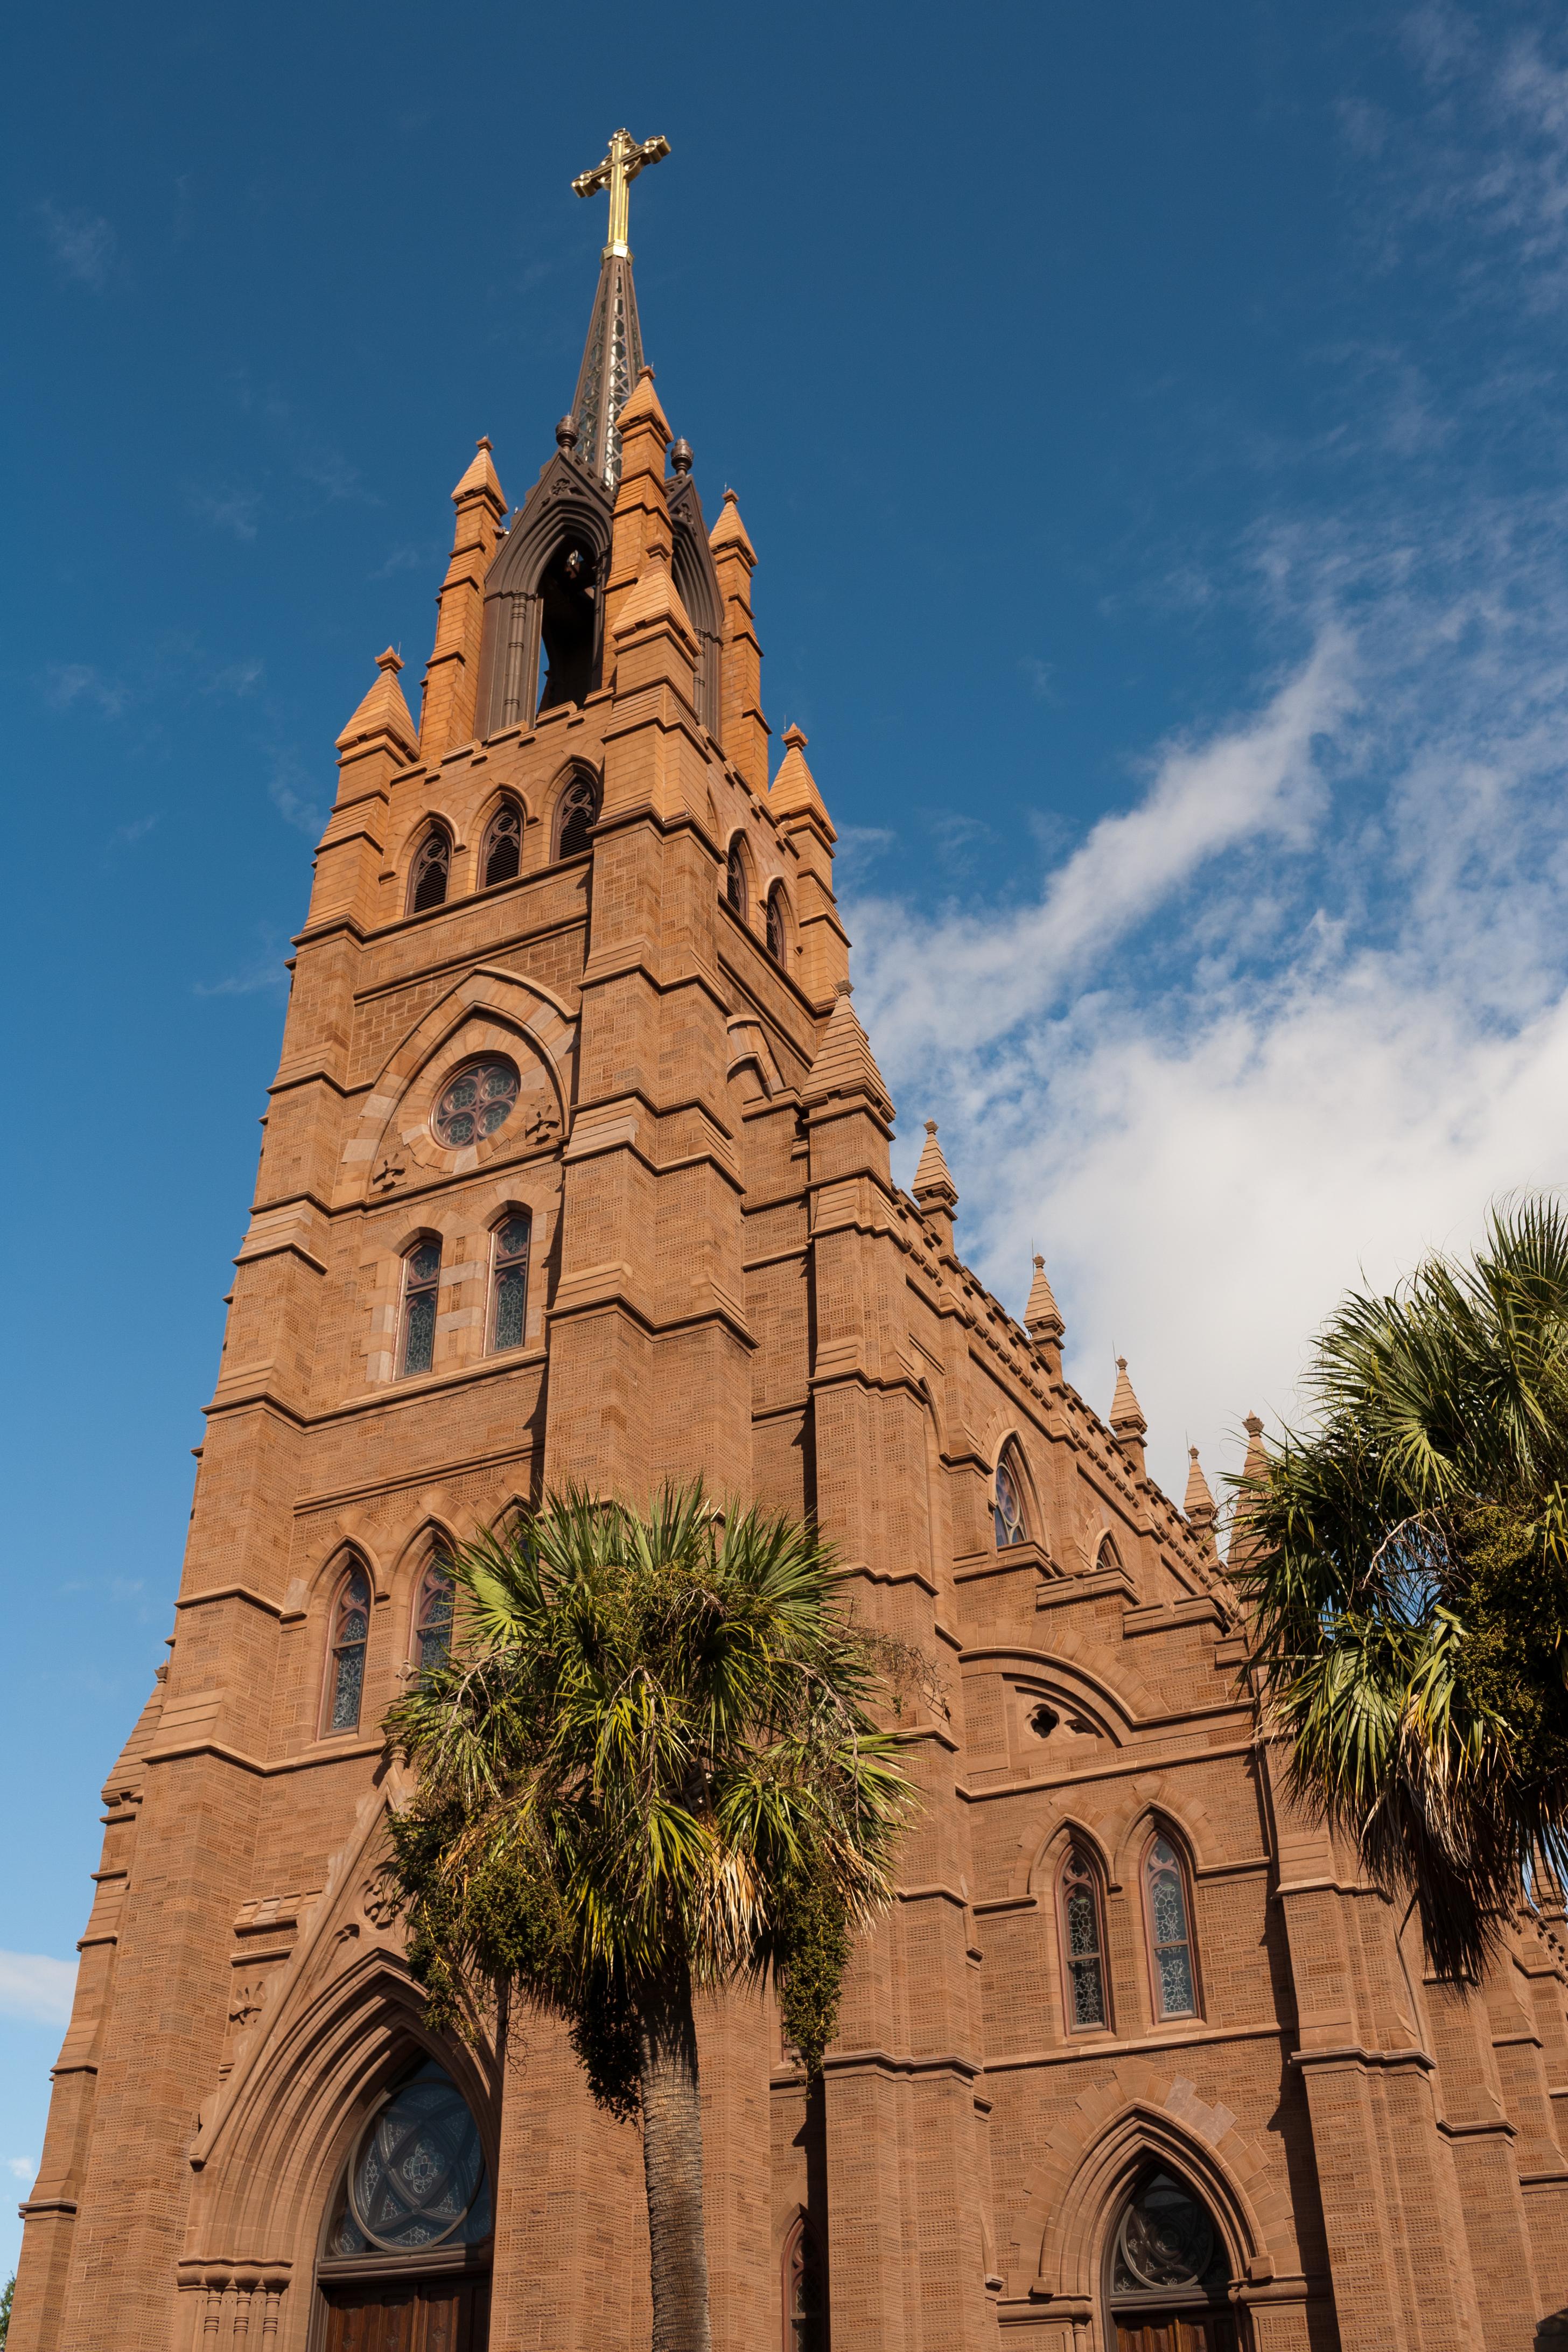 Cathedral of Saint John the Baptist (Charleston, South